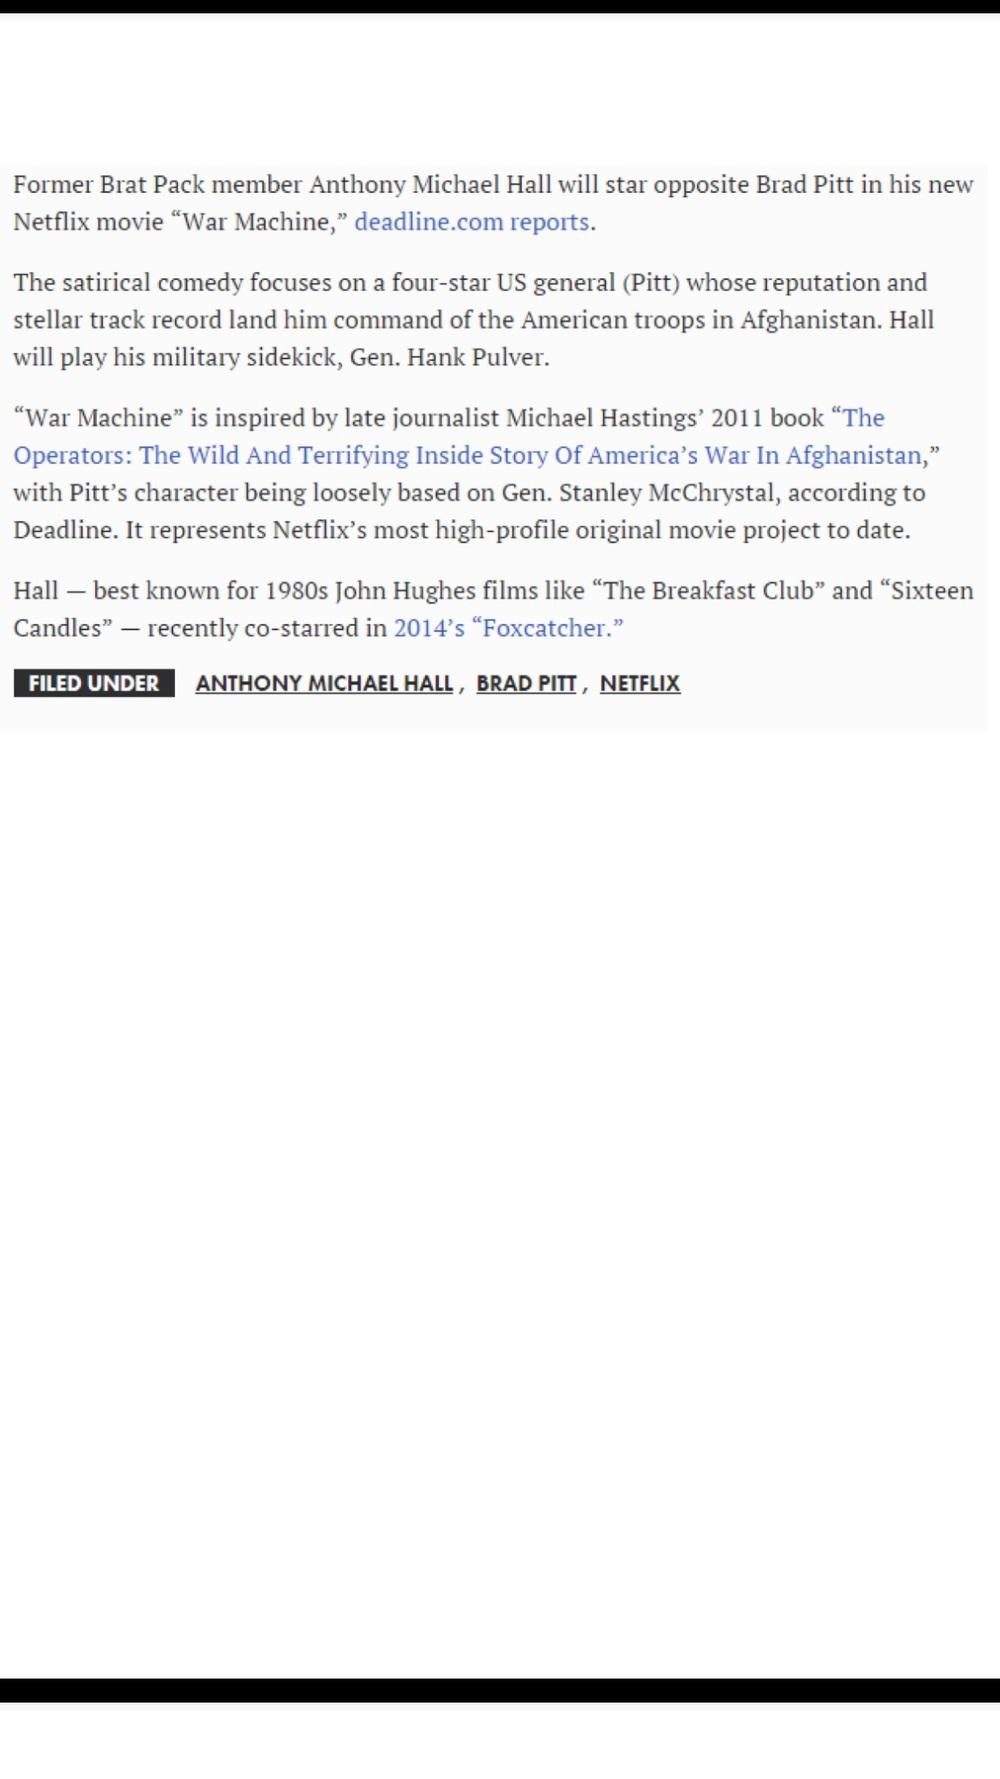 WAR MACHINE': ANTHONY MICHAEL HALL joins BRAD PITT in NETFLIX film